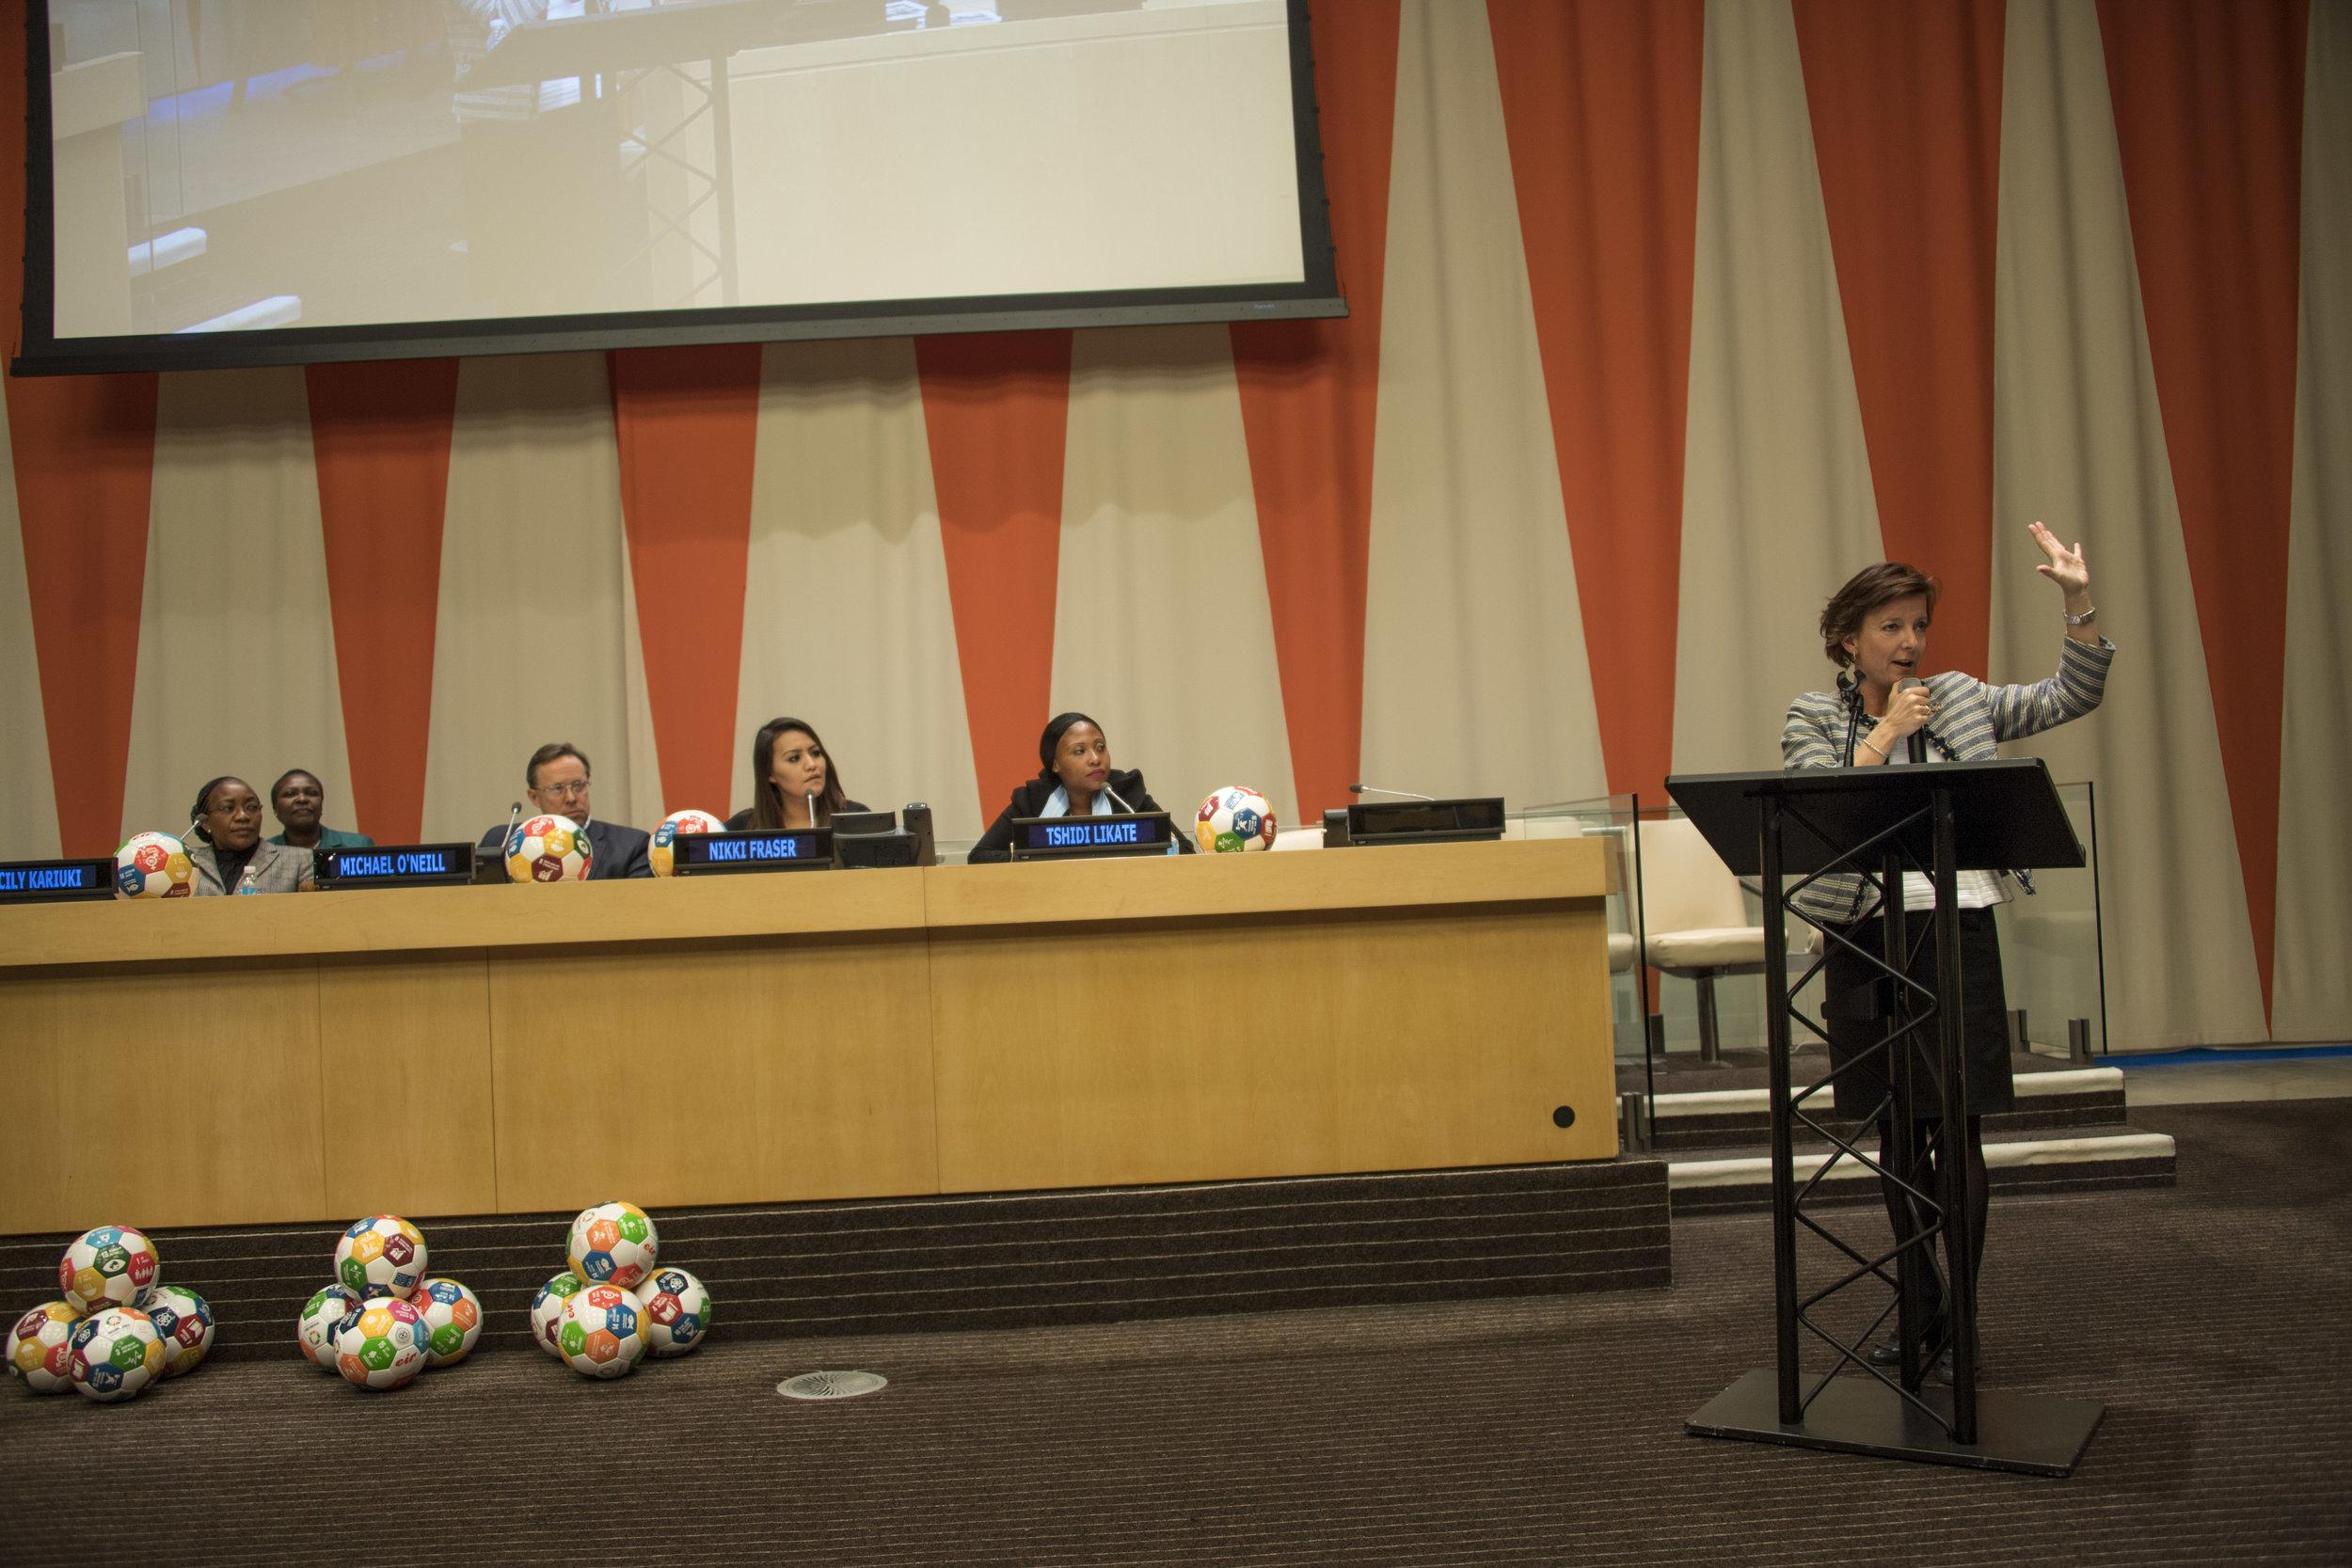 UNDP-GGWC-DreamTeam-SDG5-Goal5-players-40.jpg